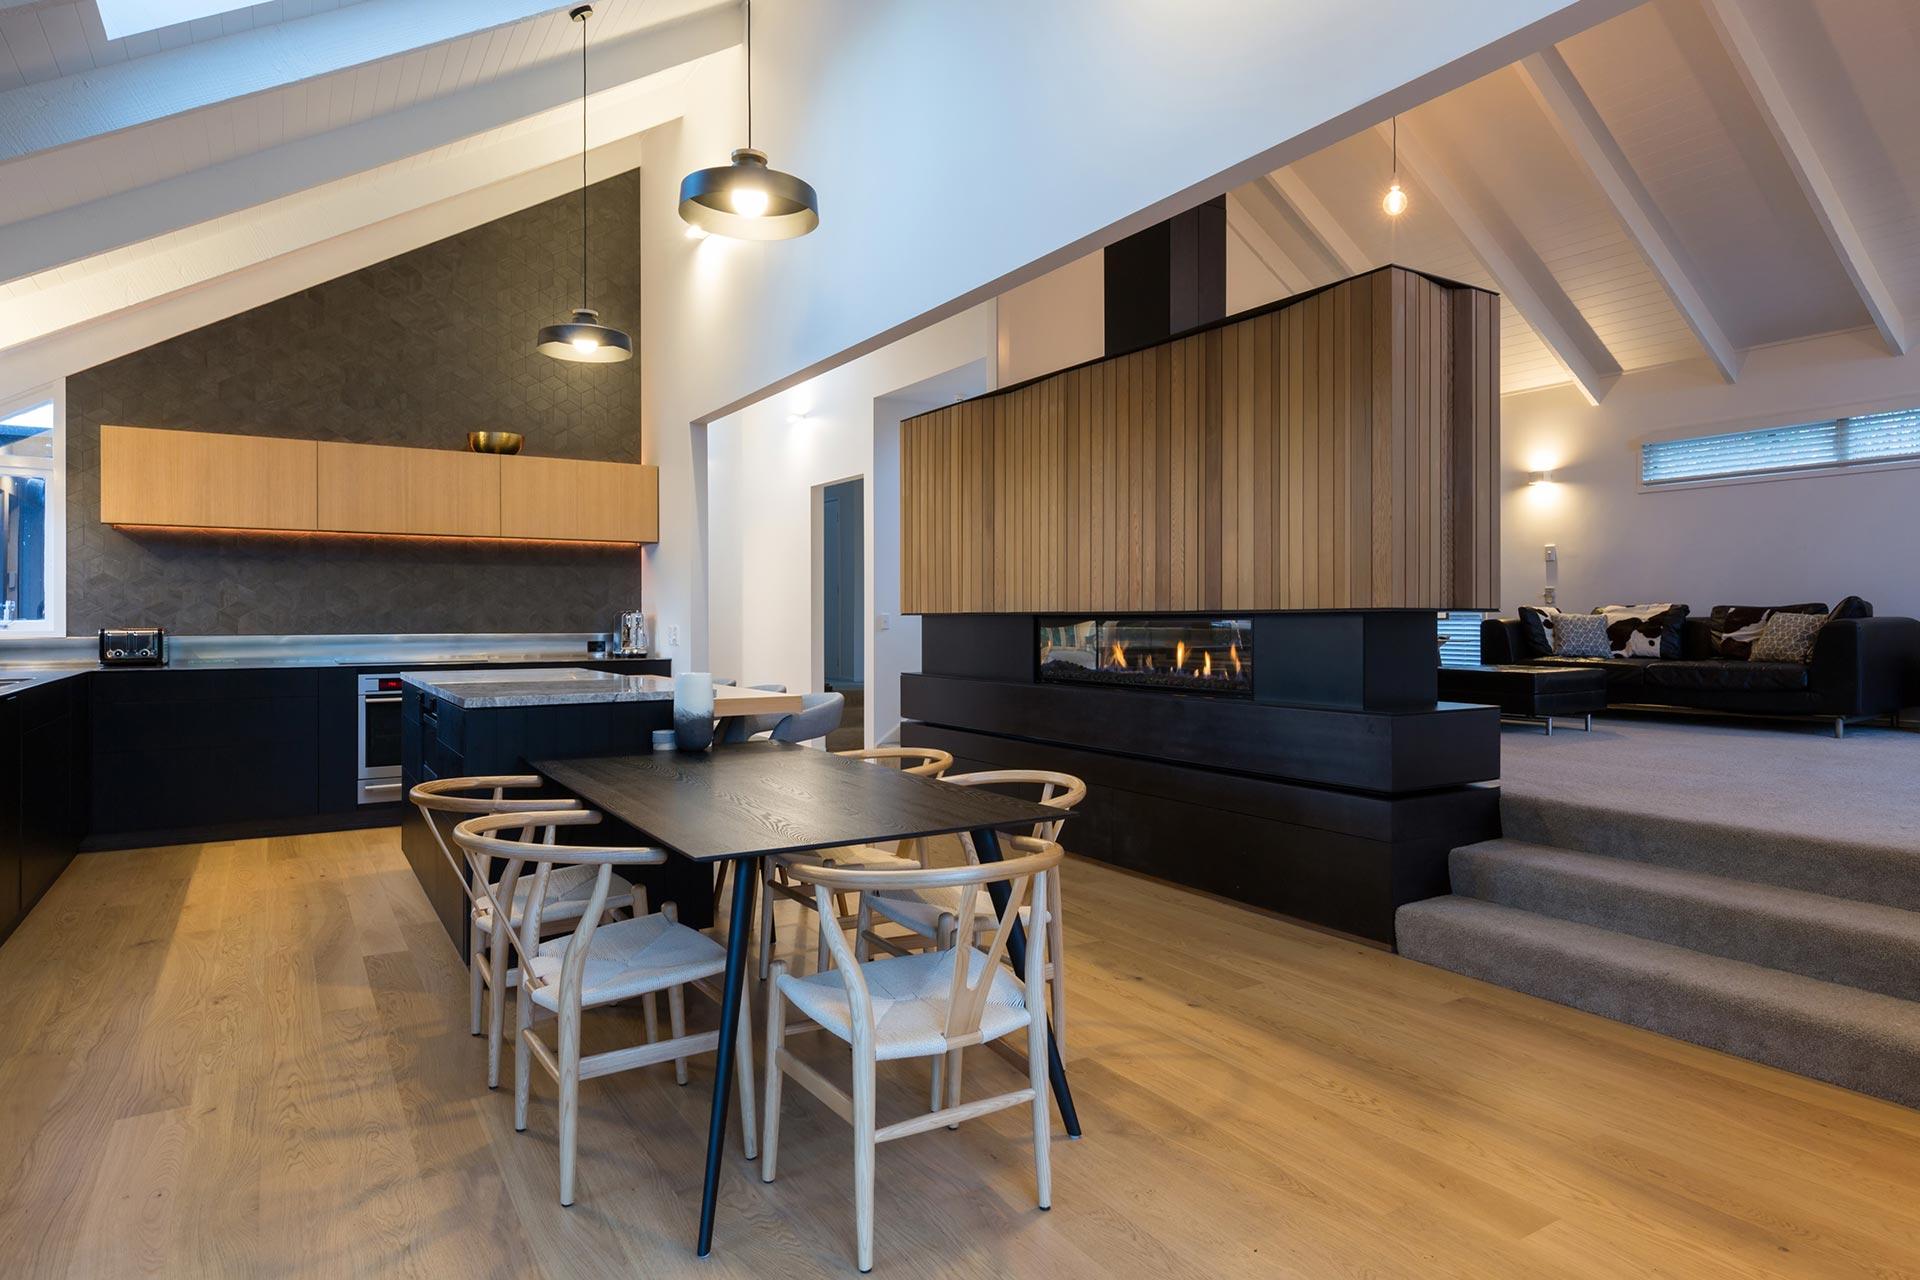 Chris O'Malley: Kitchen & fireplace